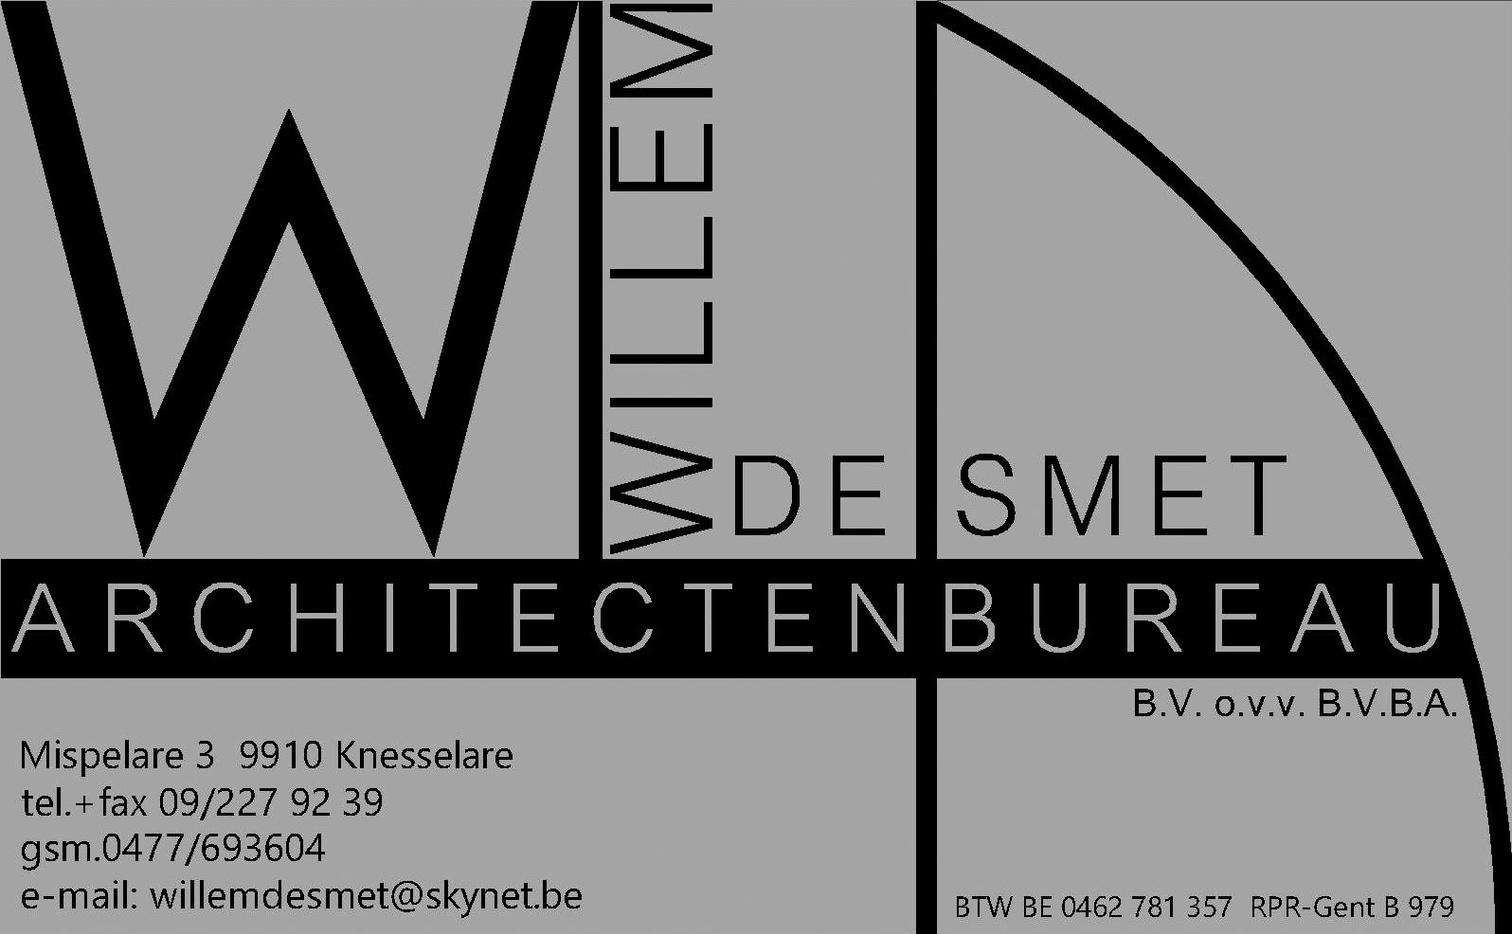 Architectenbureau De Smet Willem BVBA logo